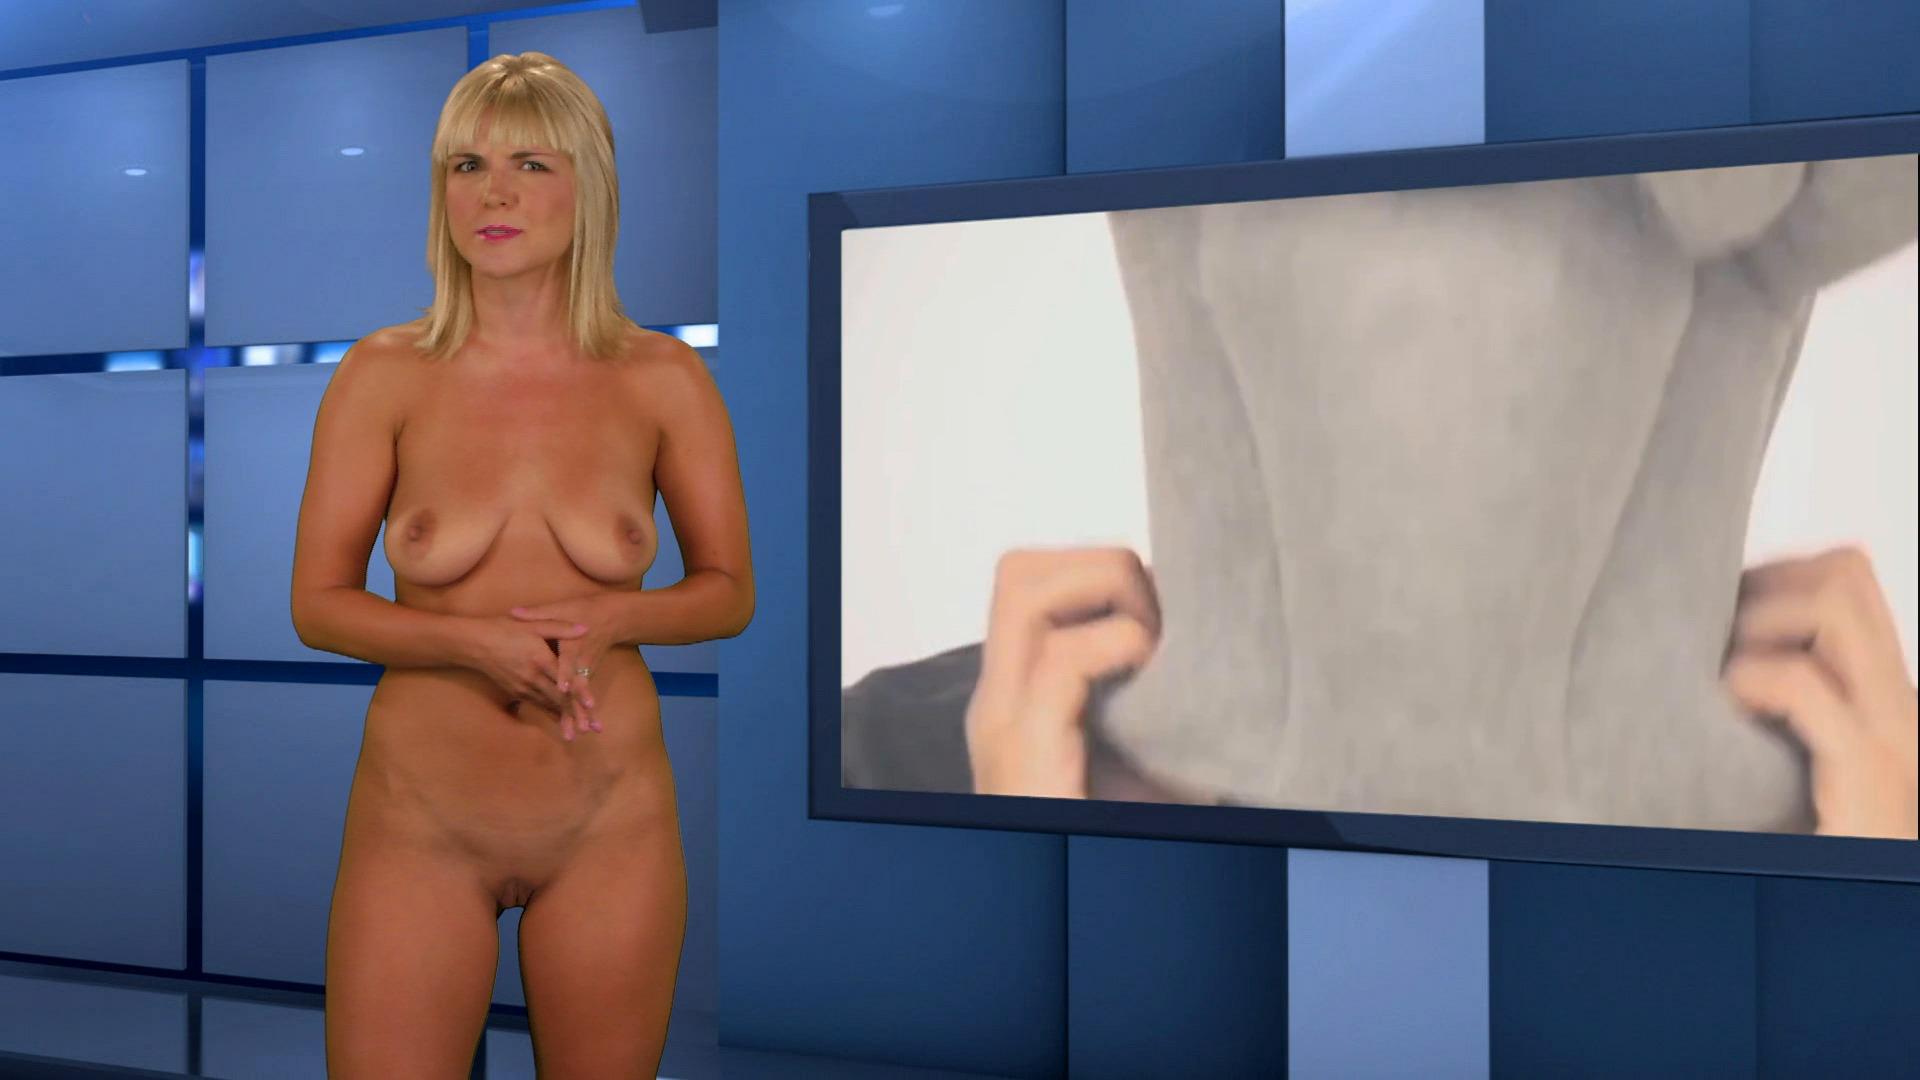 Italian Nude Newsreaders